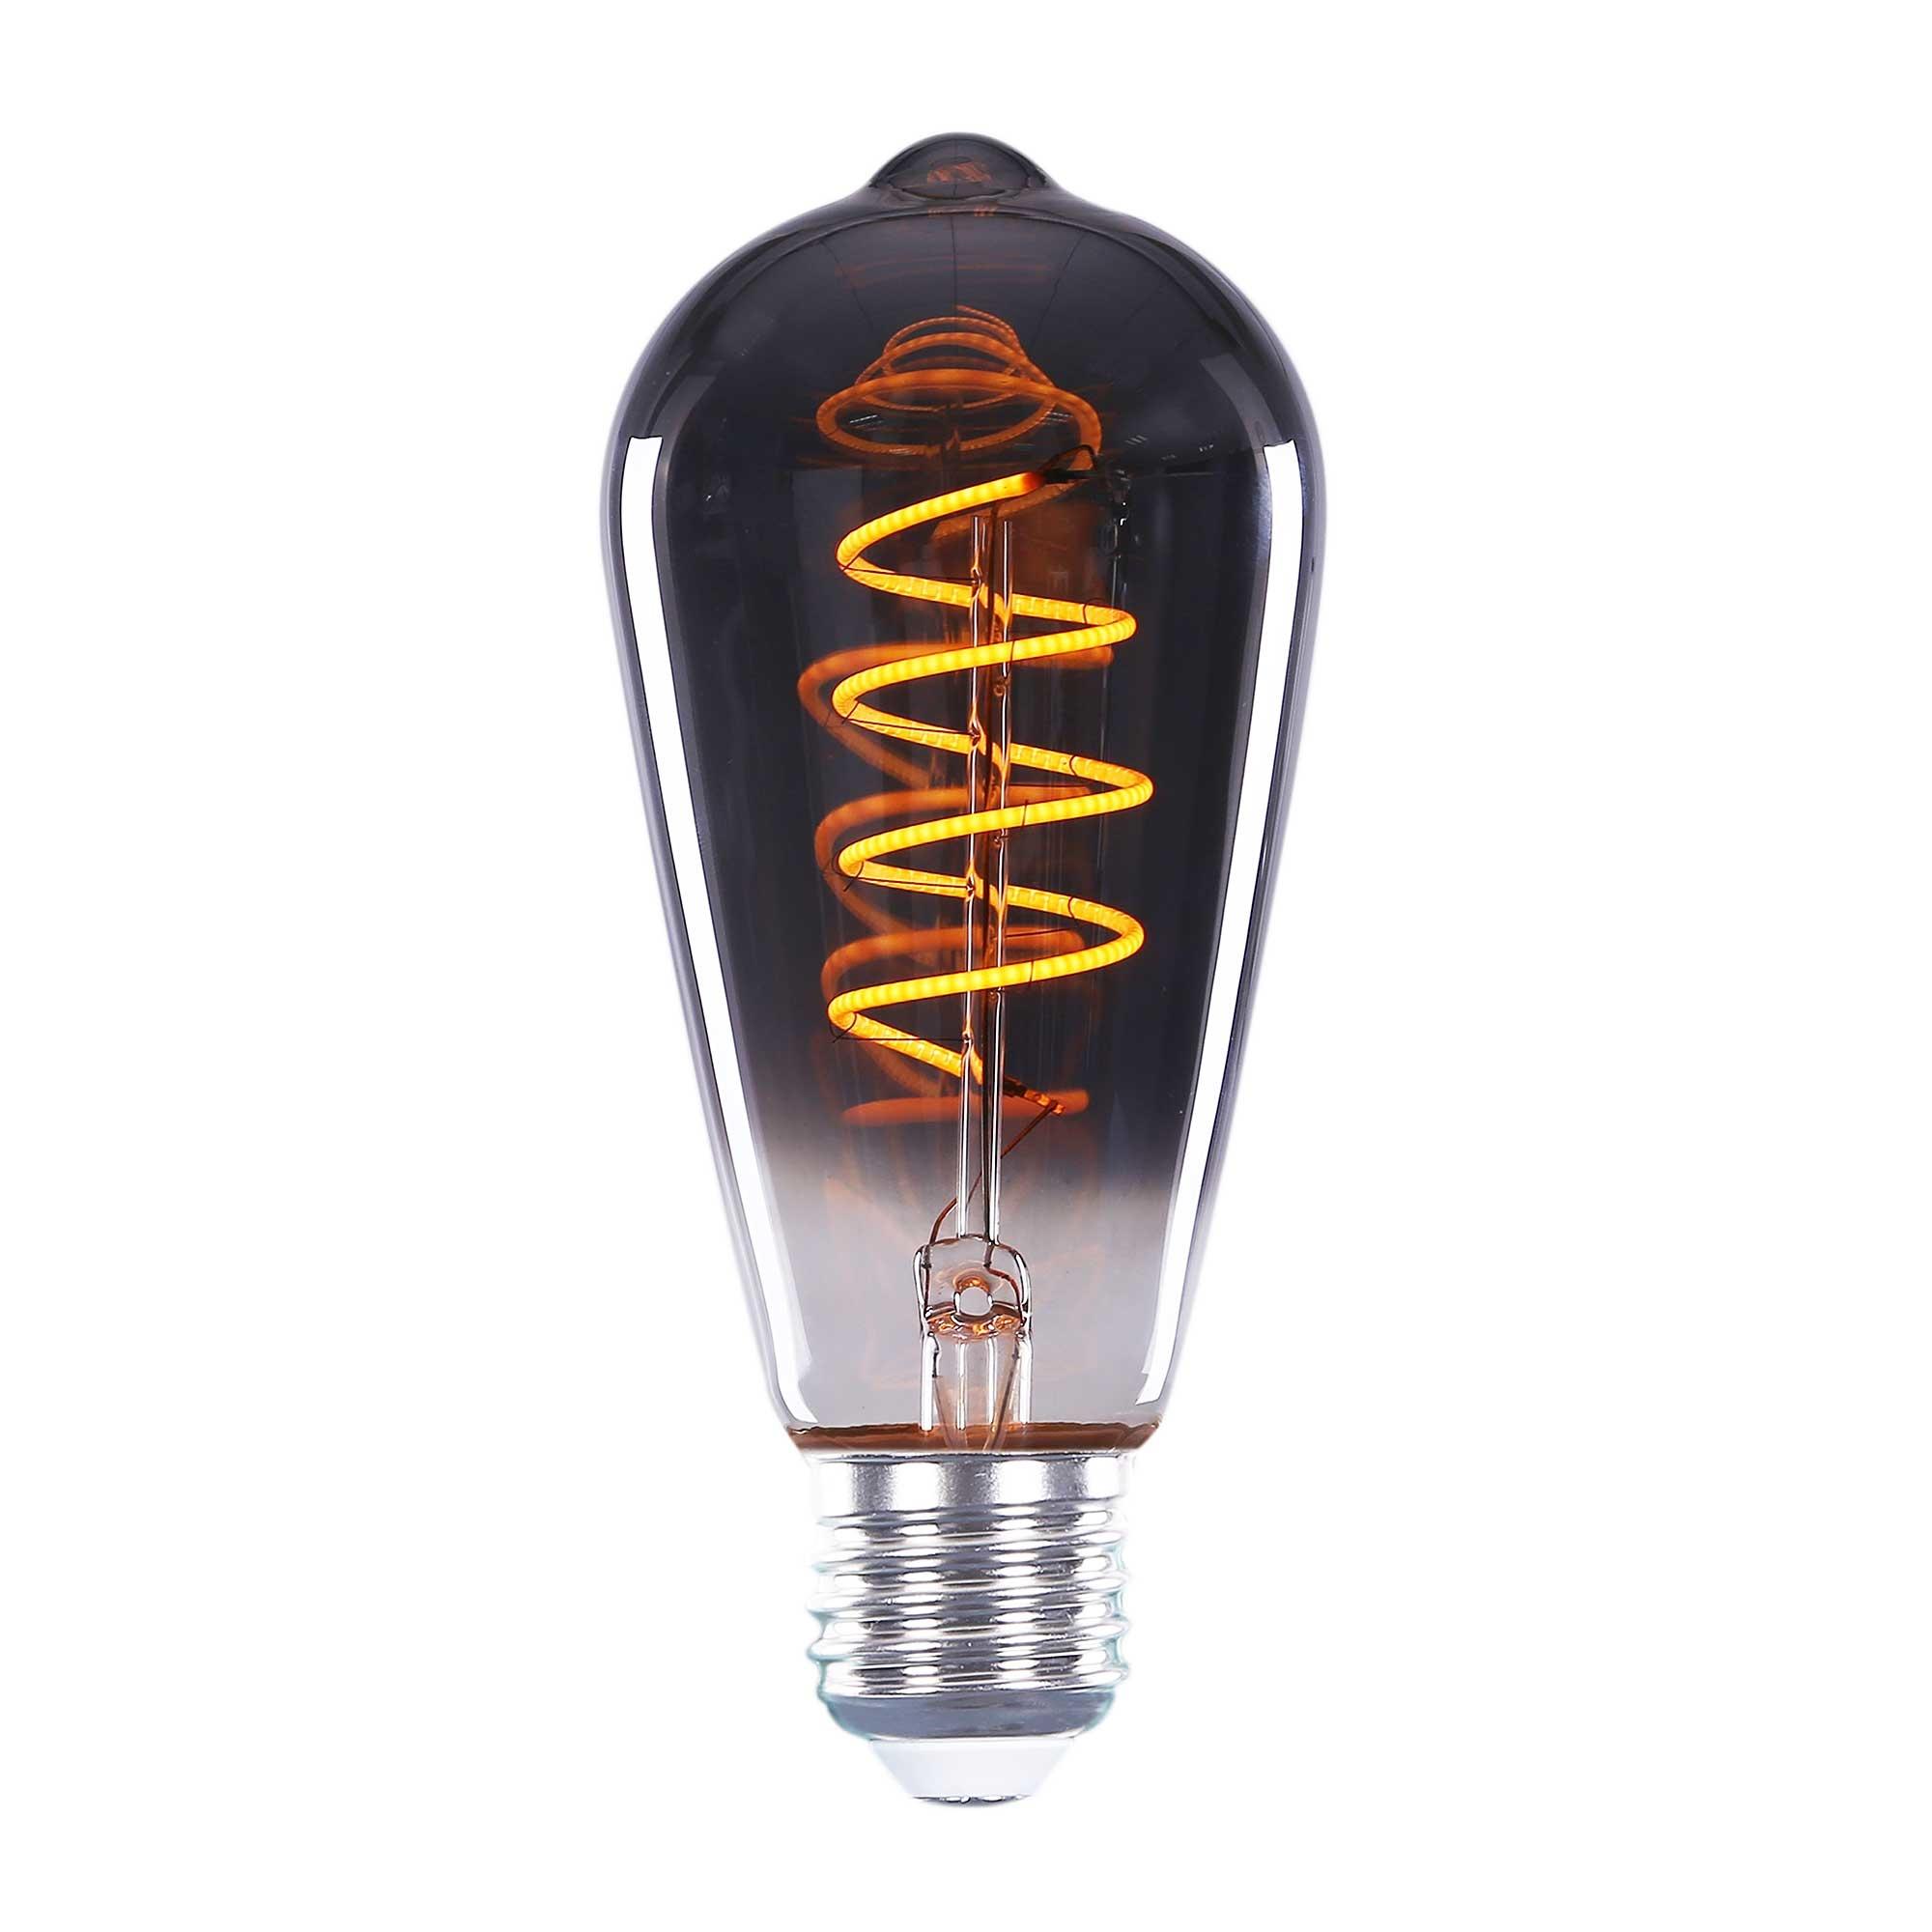 Highlight Lamp LED ST64 4W 100LM 2200K Dimbaar Rook